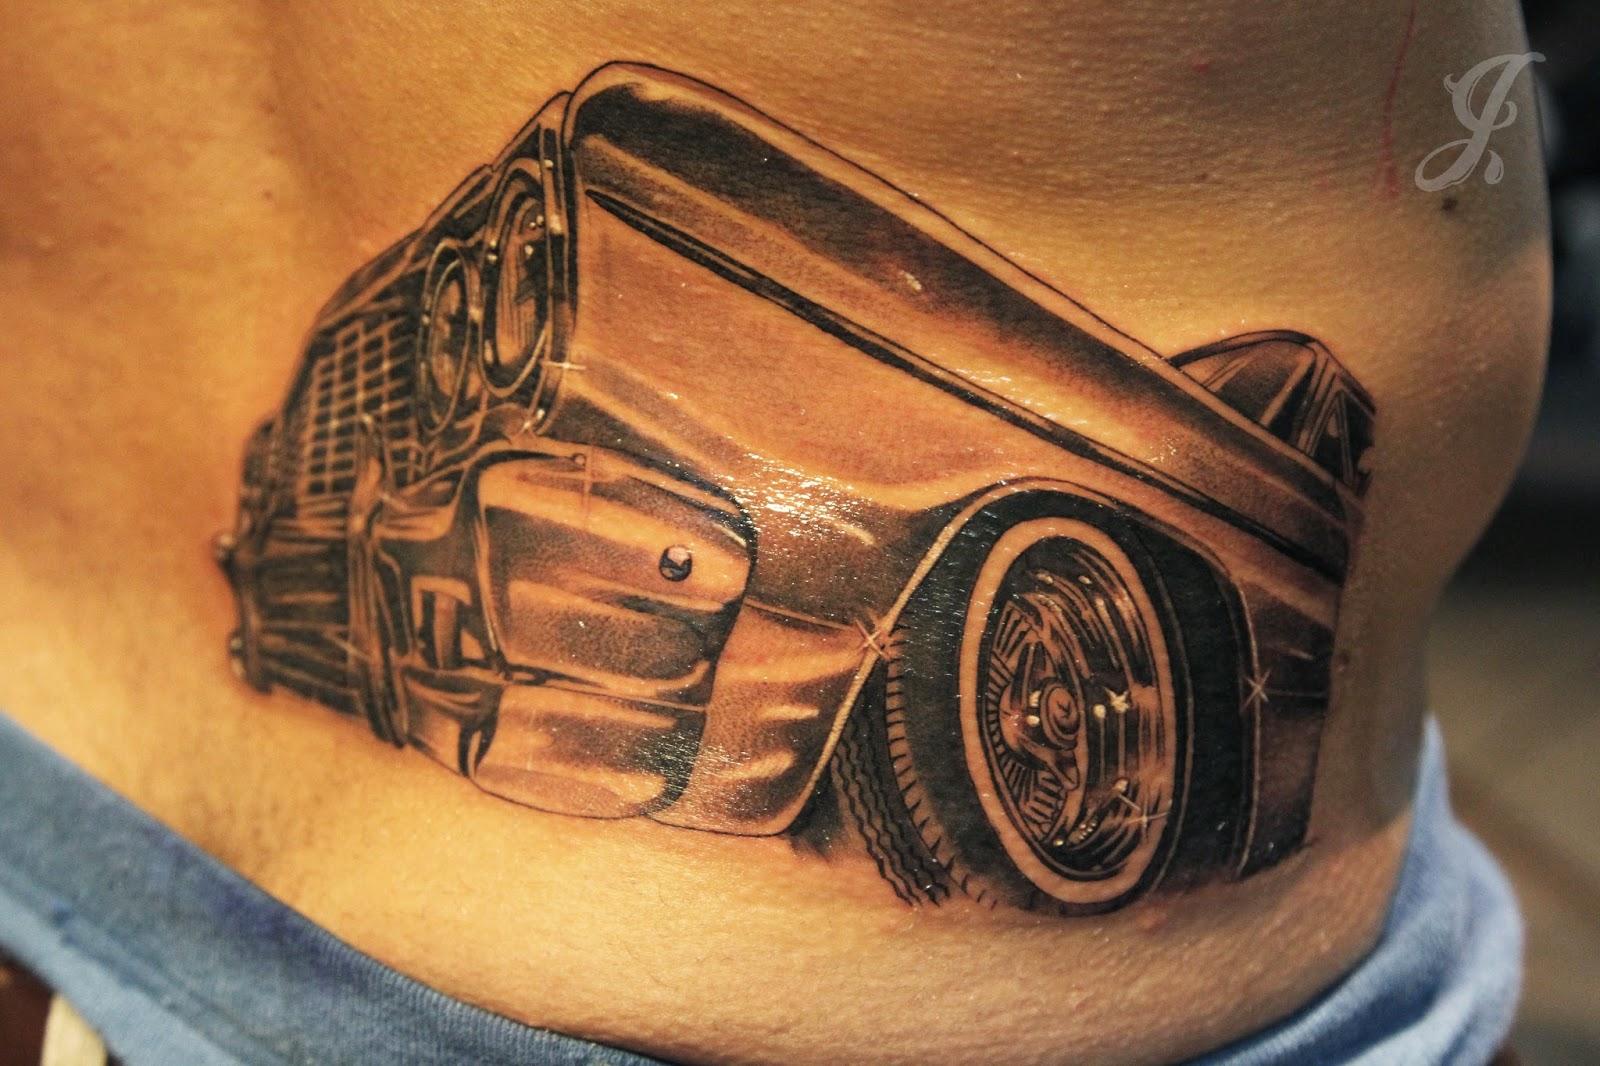 64 Impala Lowrider Tattoo